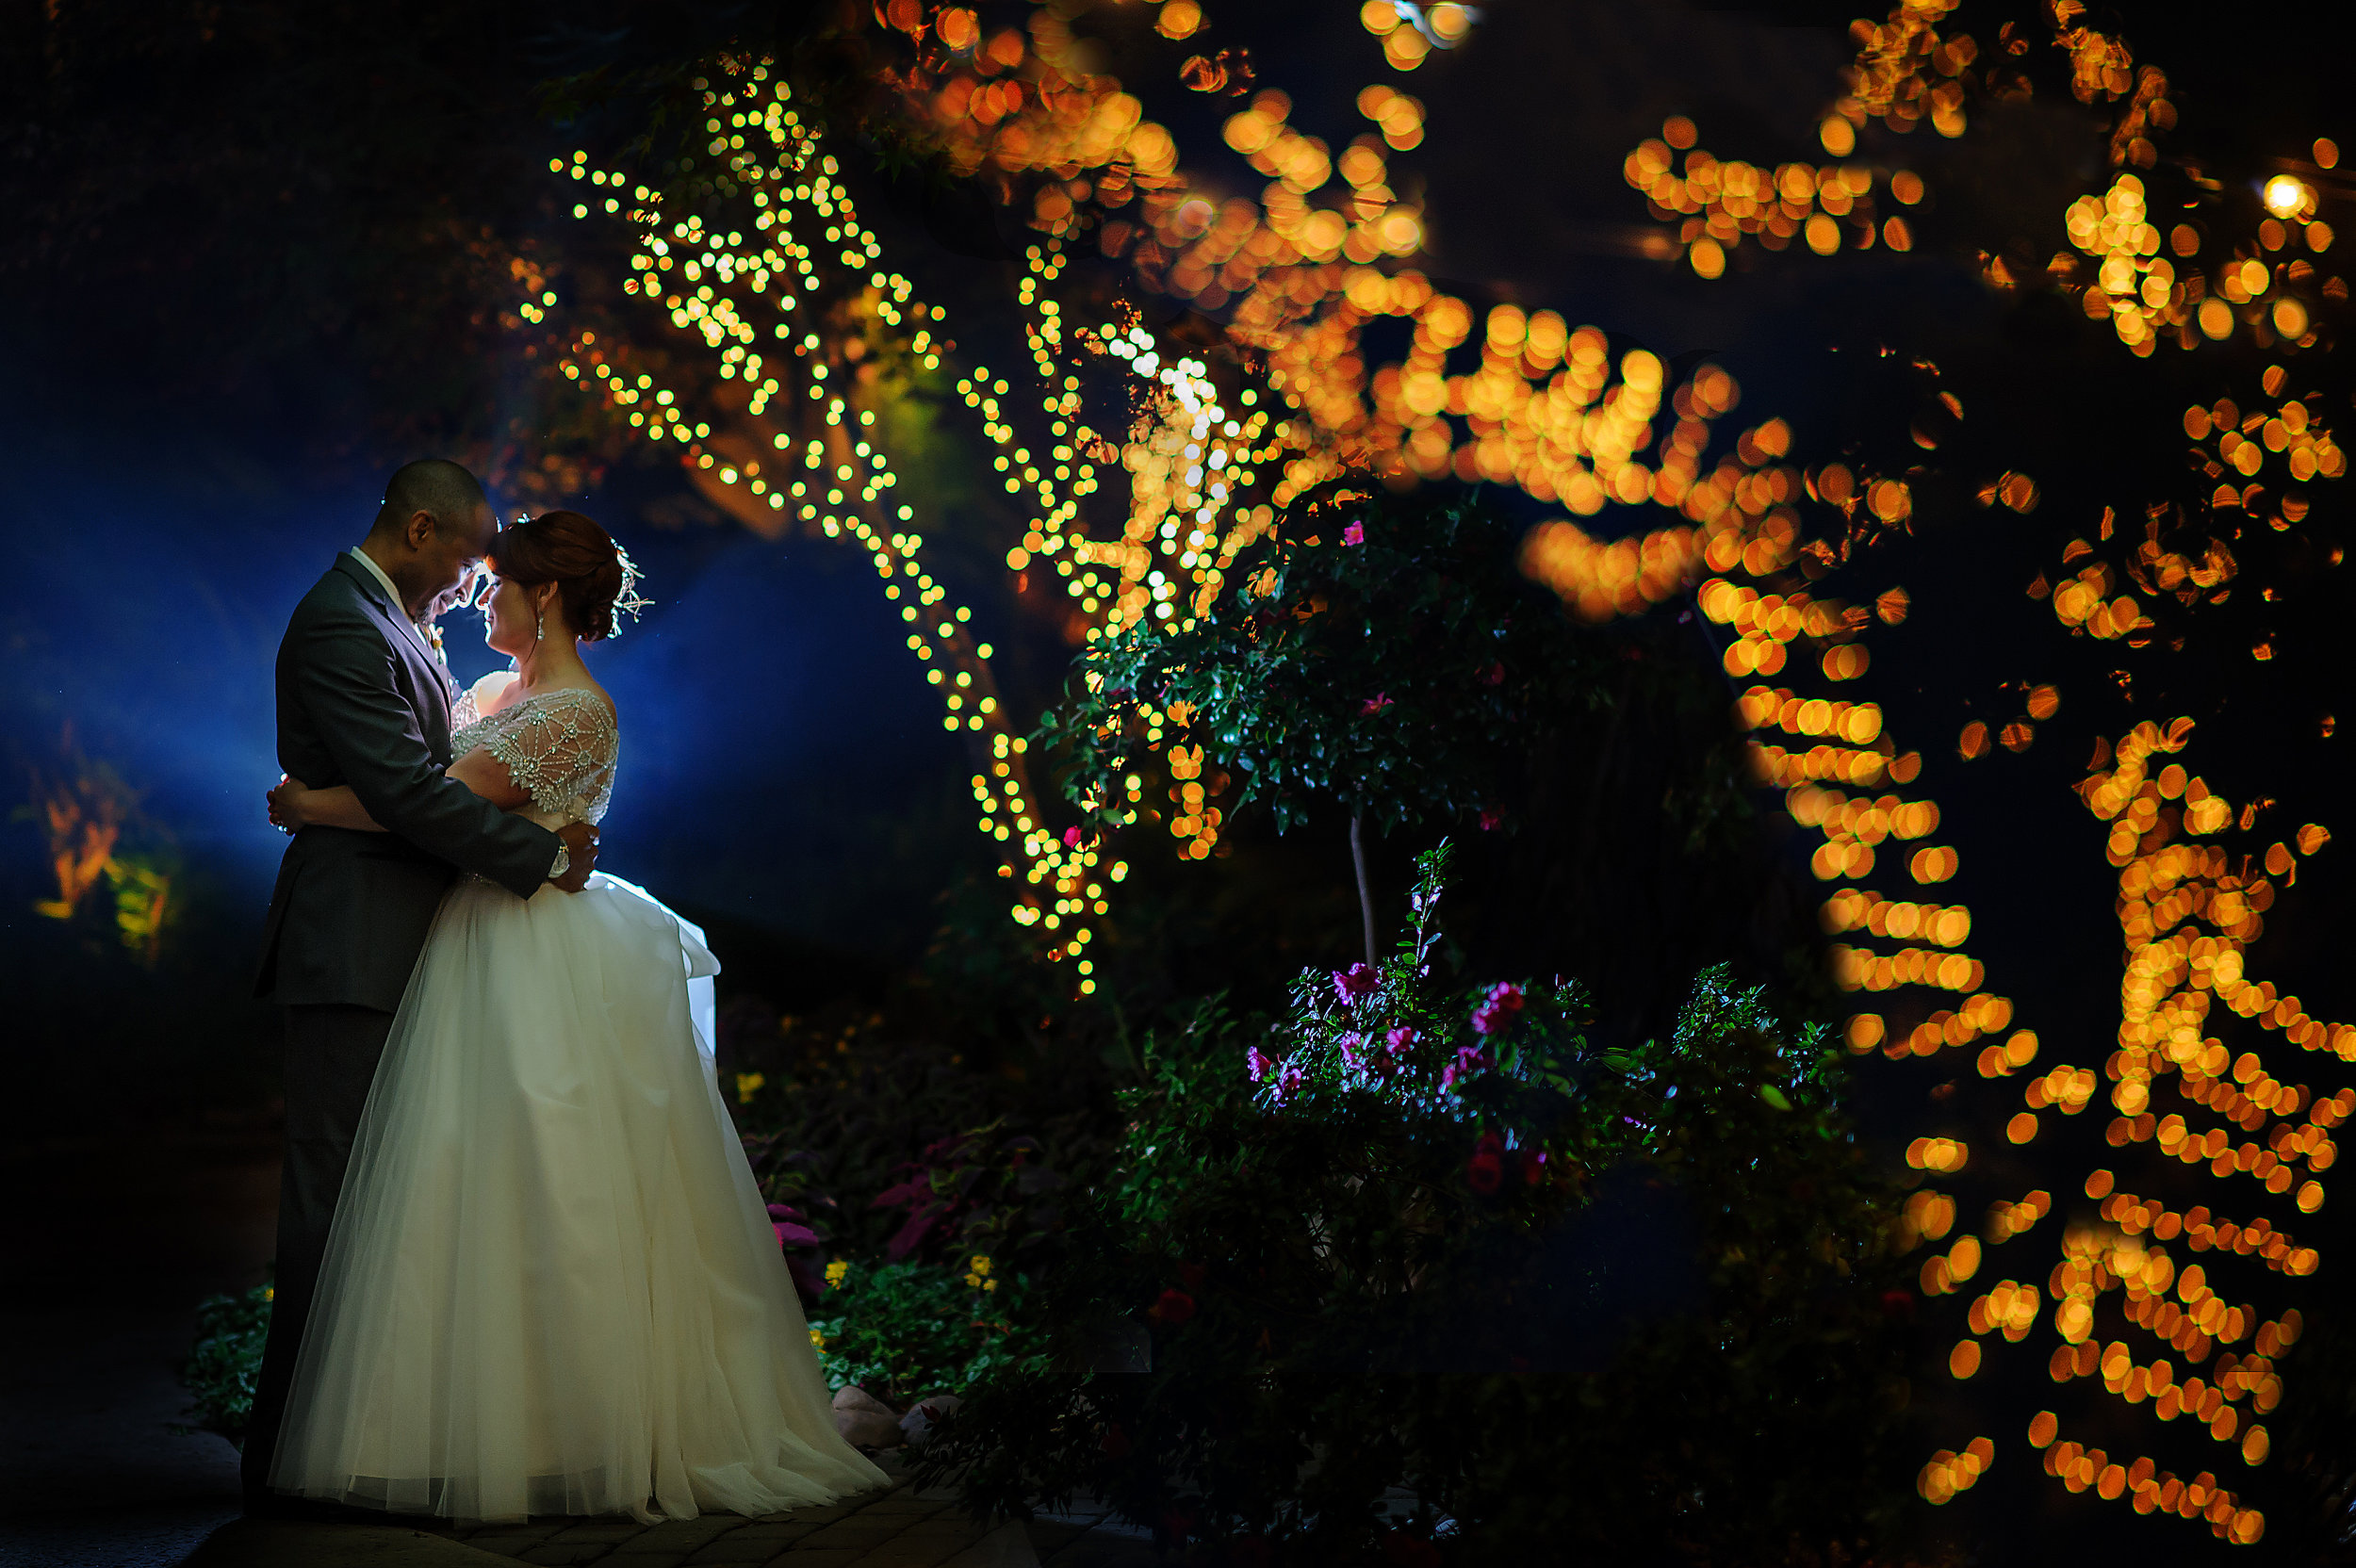 mira-khaim-018-wine-and-roses-lodi-wedding-photographer-katherine-nicole-photography.JPG